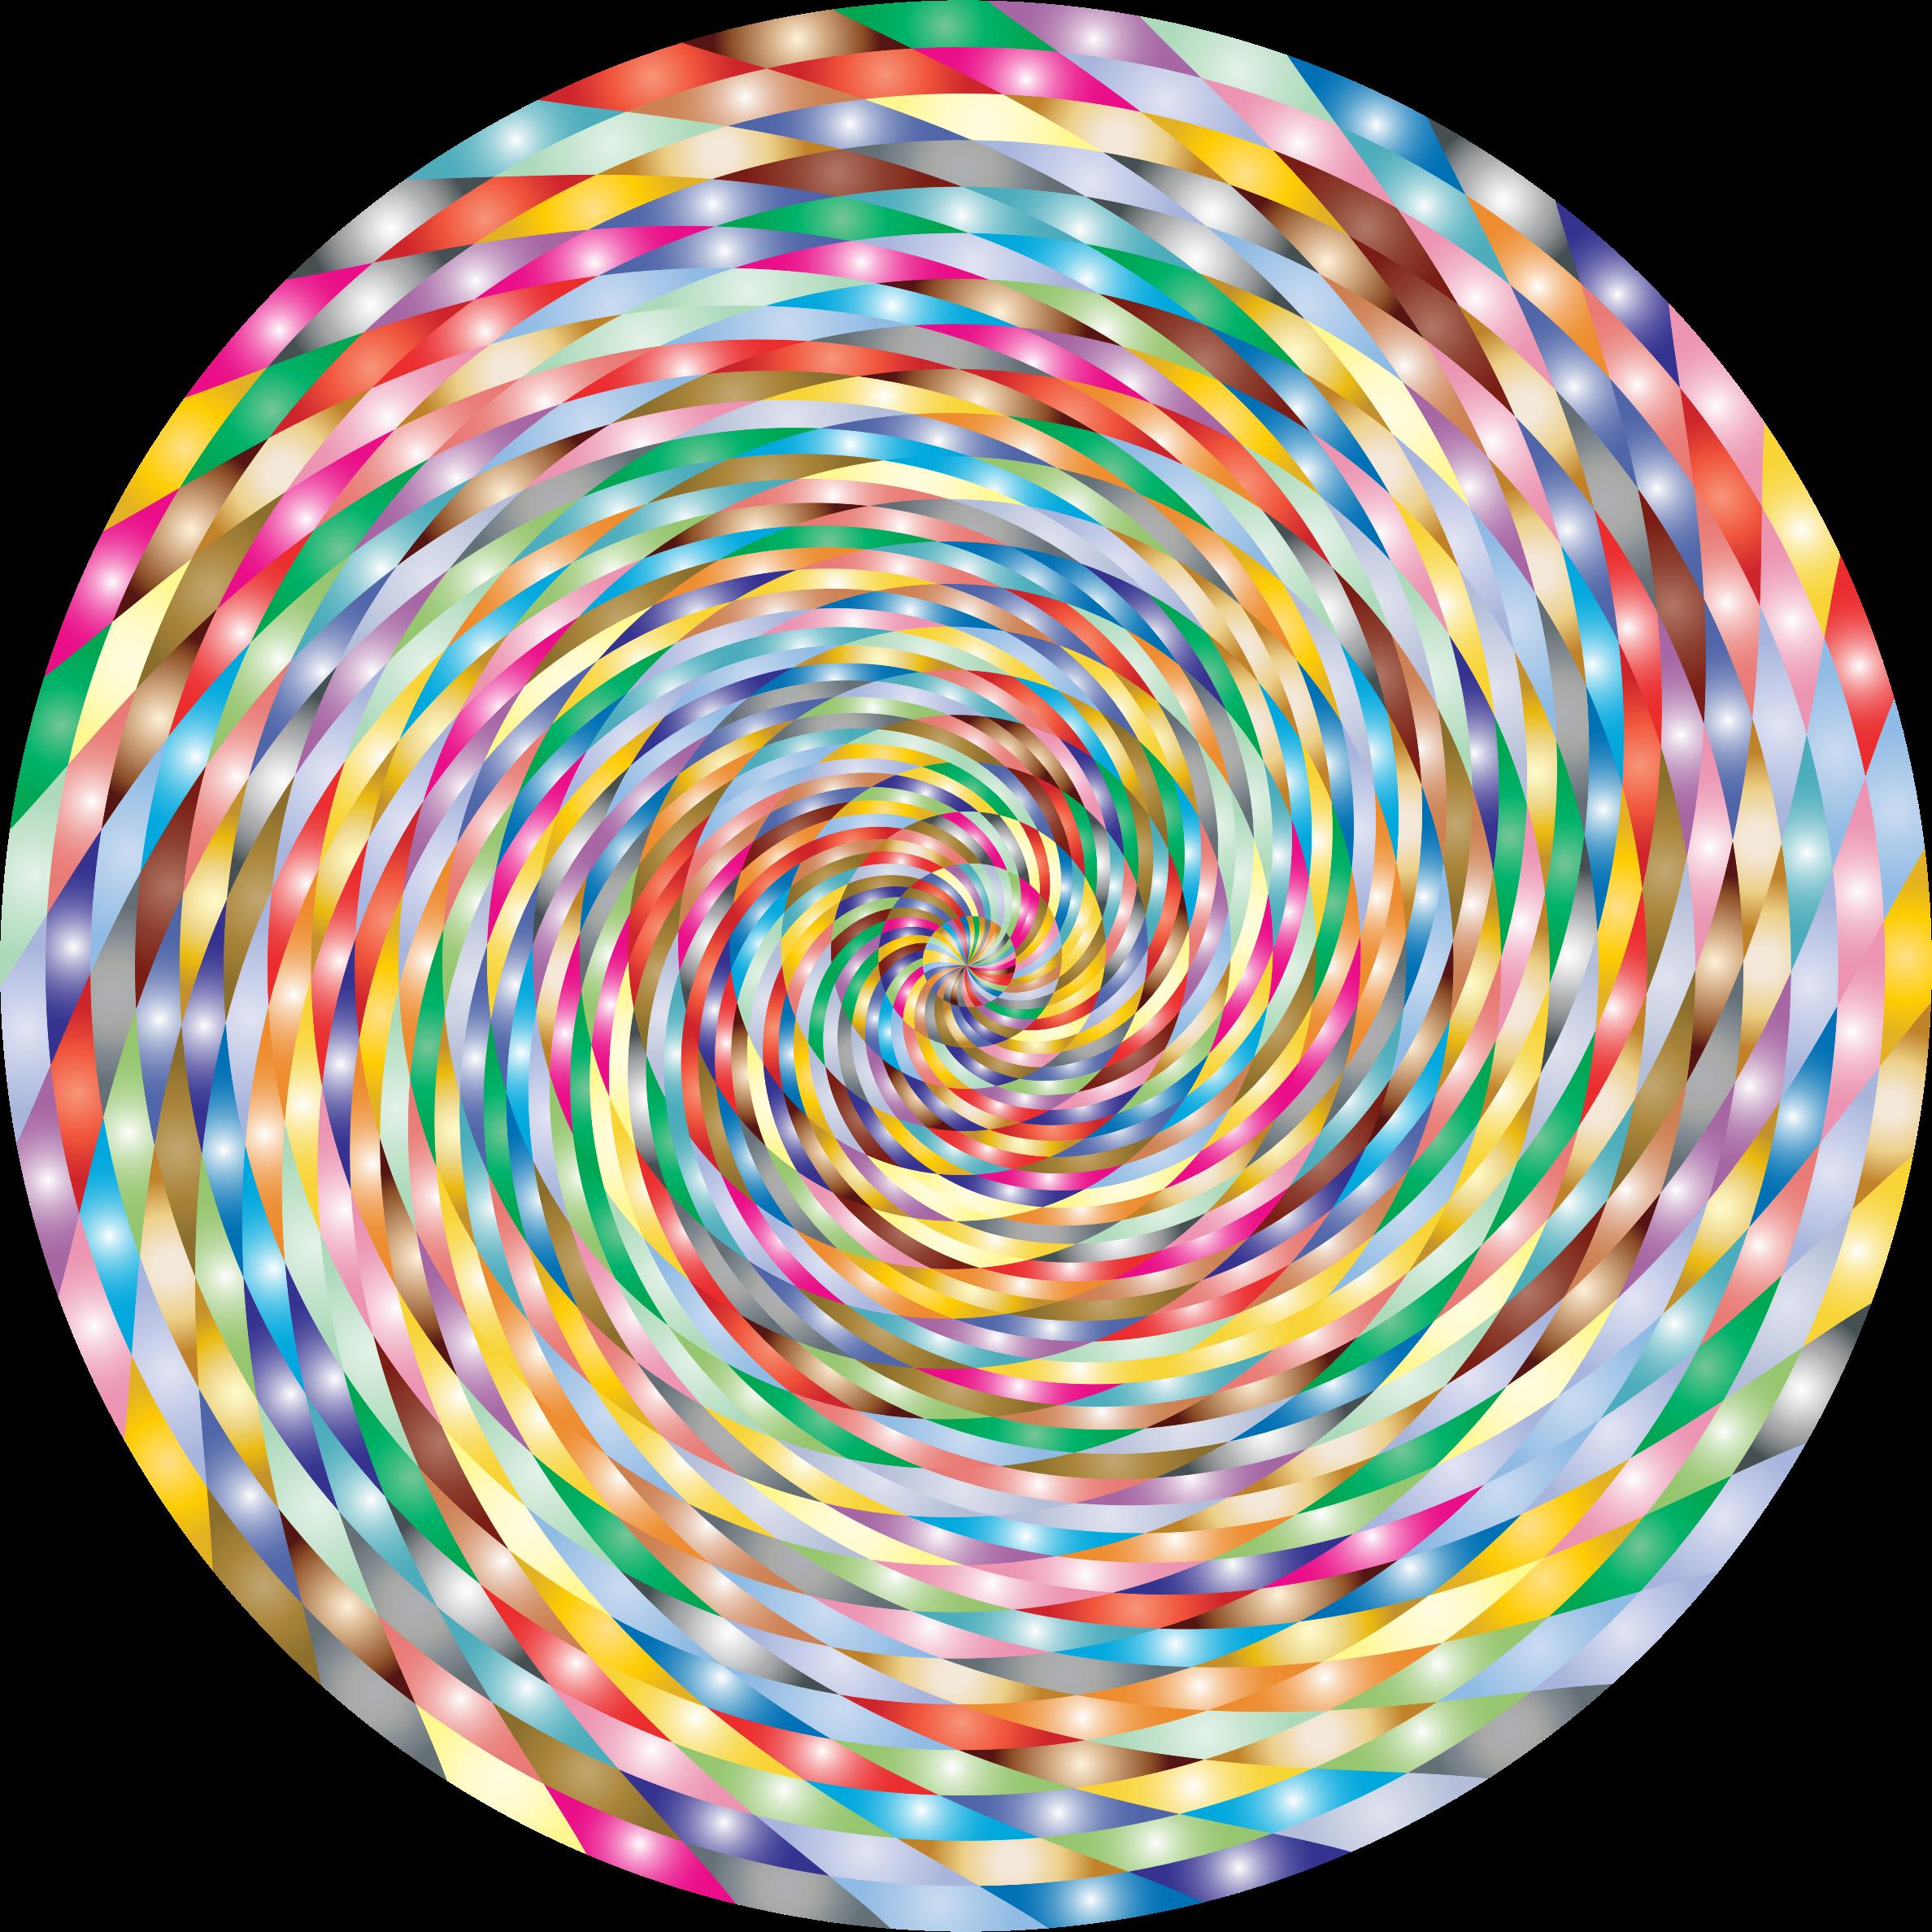 Lollipop clipart circle. The good ship big